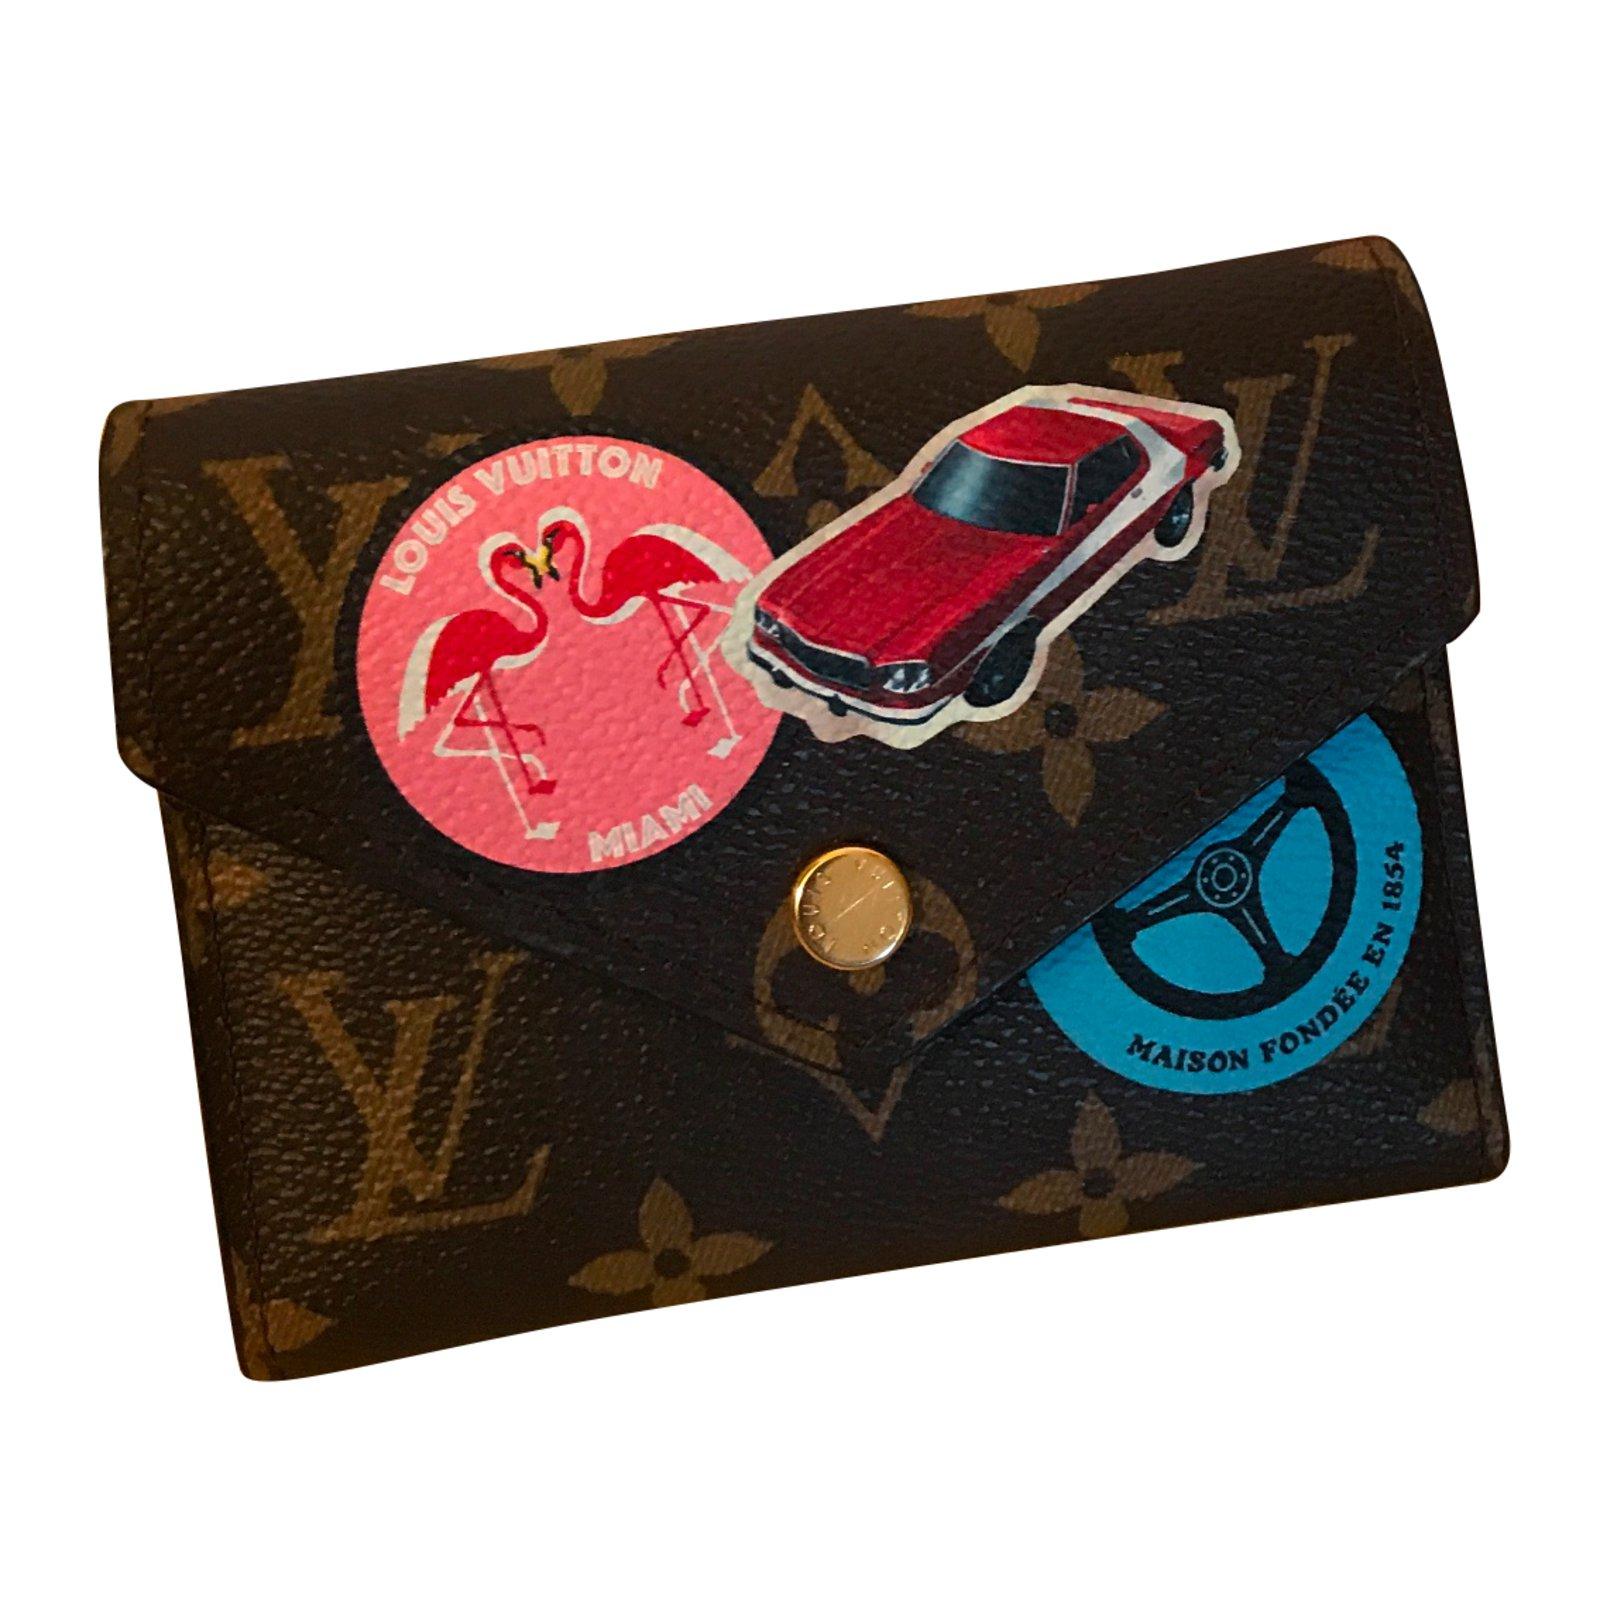 Louis Vuitton Louis Vuitton Victorine World Tour Collector Wallets Cloth Other Ref 49519 Joli Closet